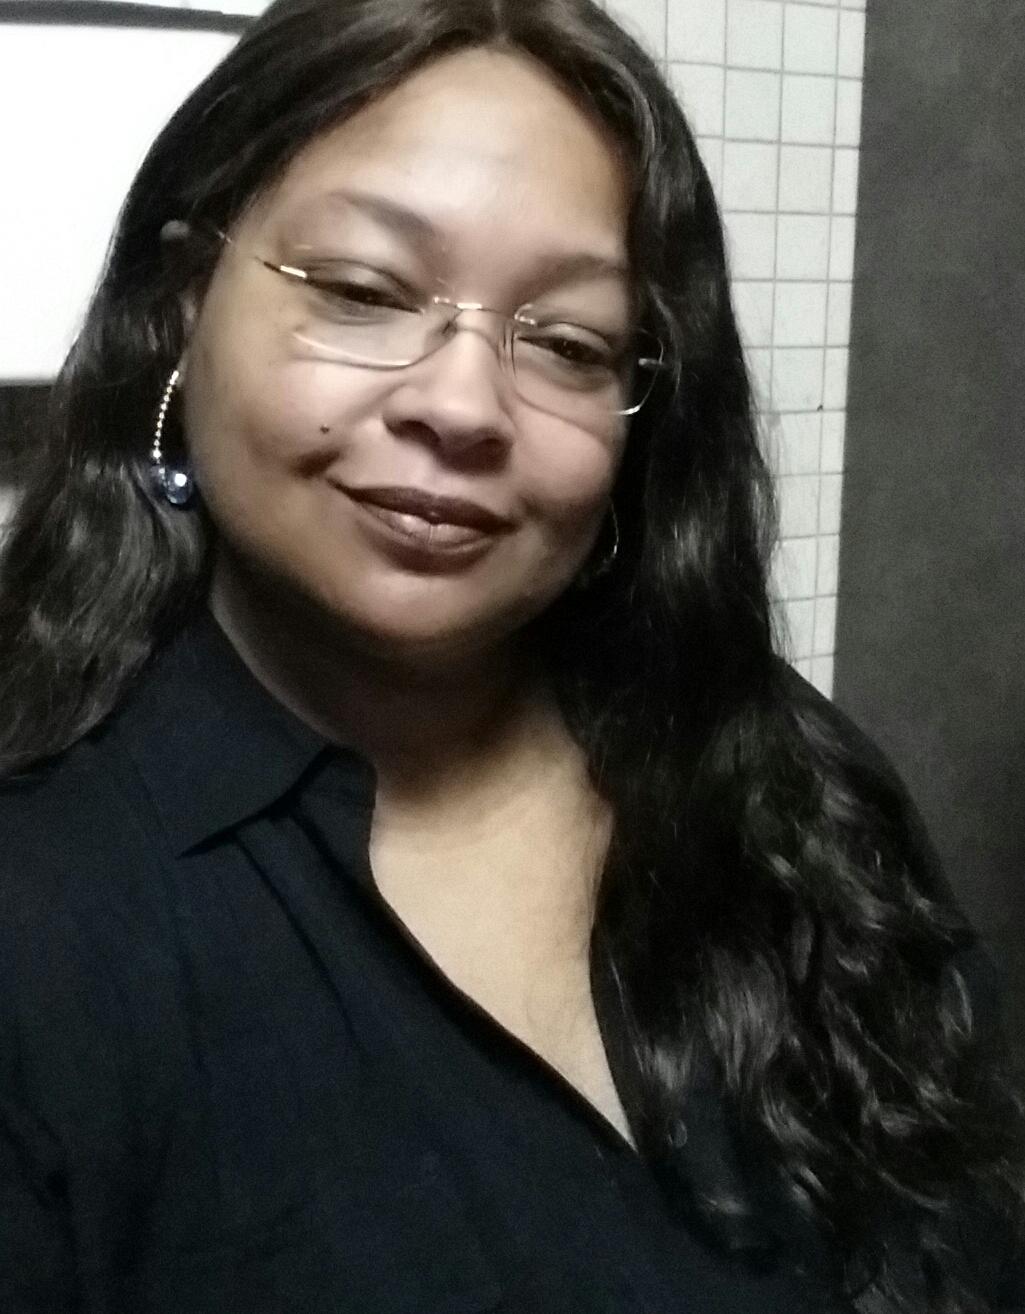 Glueless Full Lace Wigs Straight Indian Remy Hair  wwwBestLaceWigscom